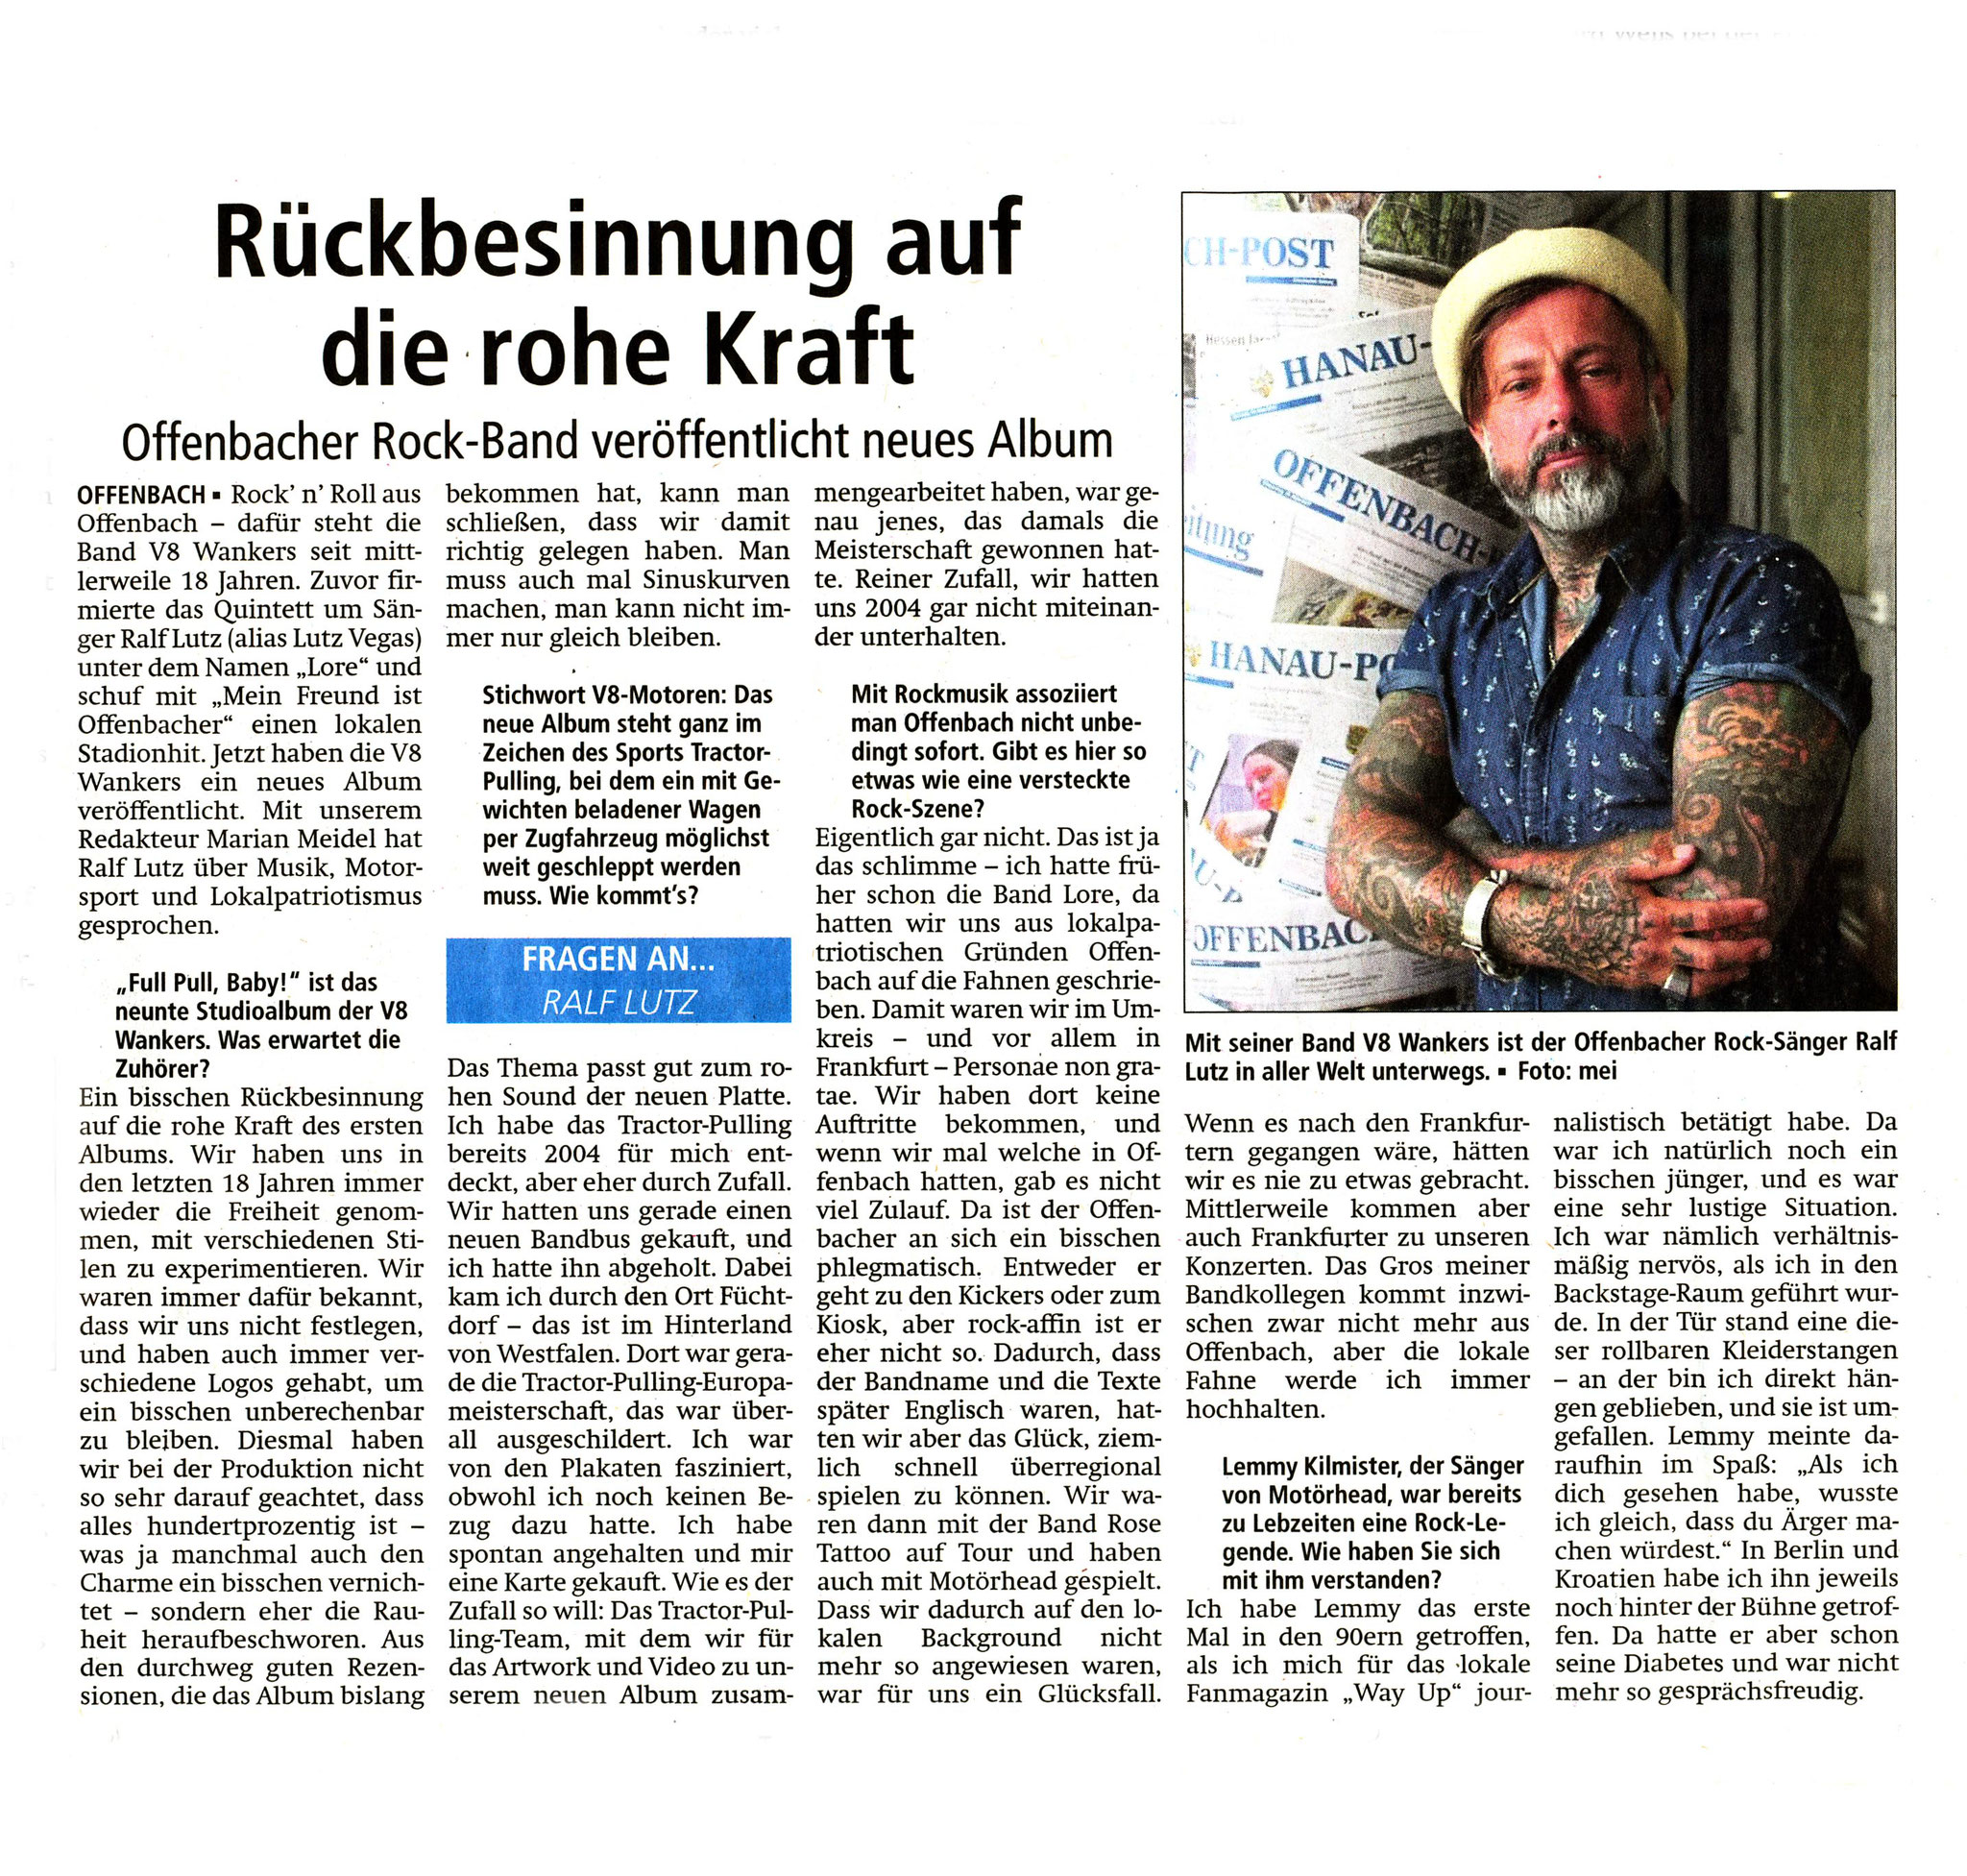 Offenbach Post, 26. Mai 2018